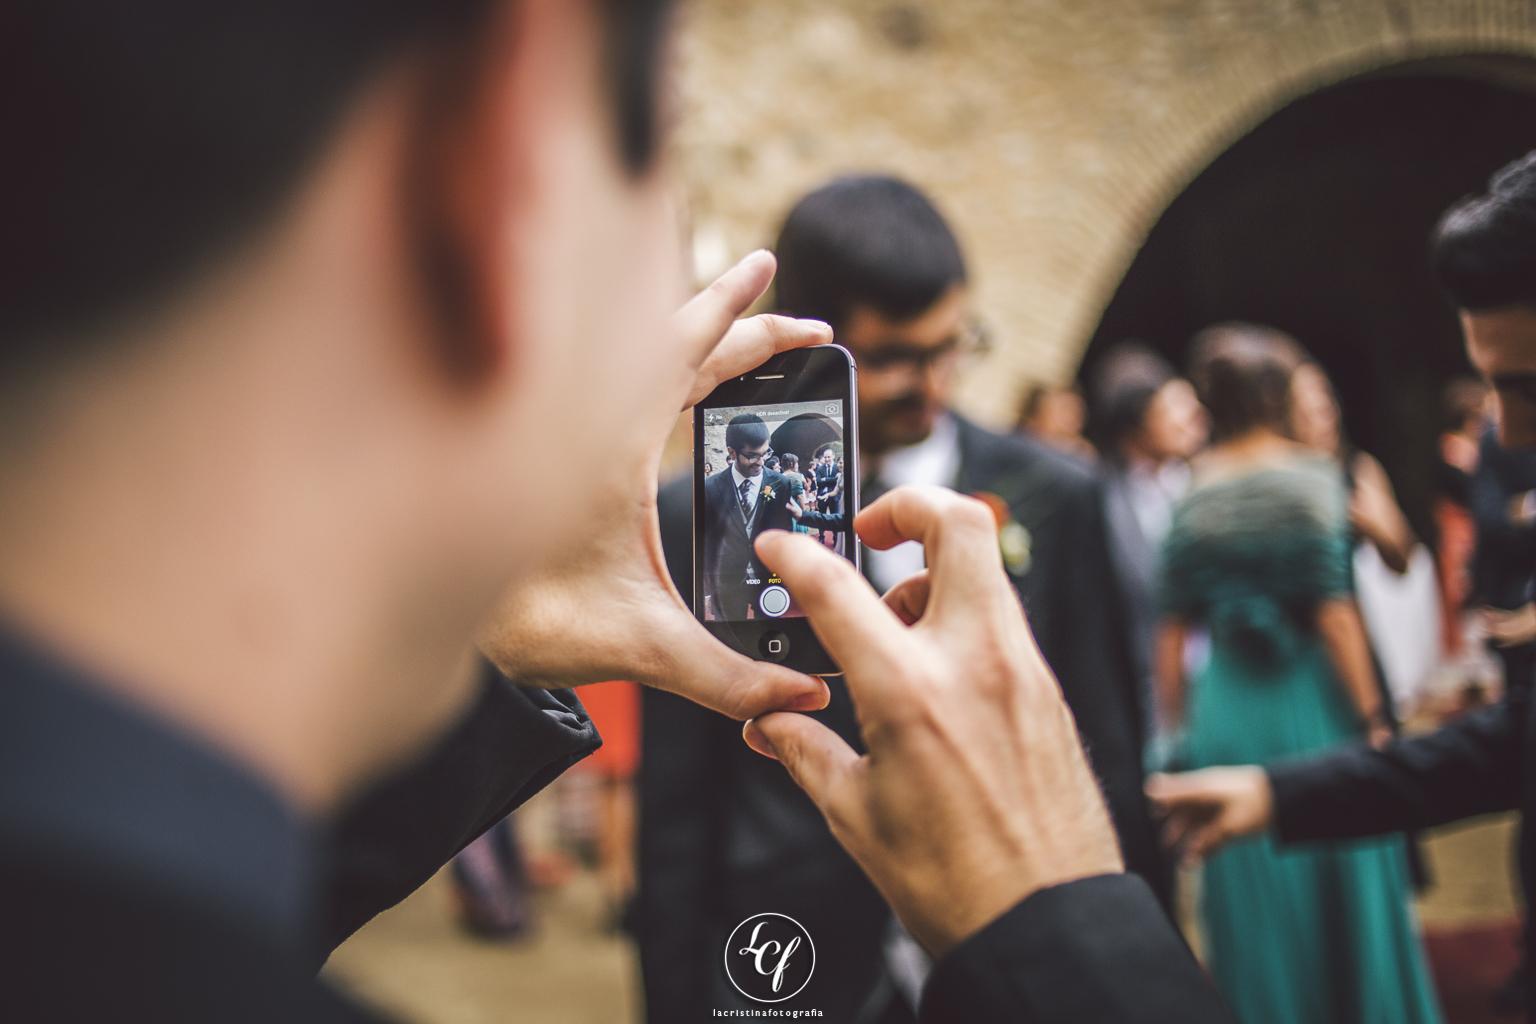 fotógrafo de boda :: fotógrafo de bodas :: boda en cortal gran :: boda en girona :: boda en el campo :: boda en una masia